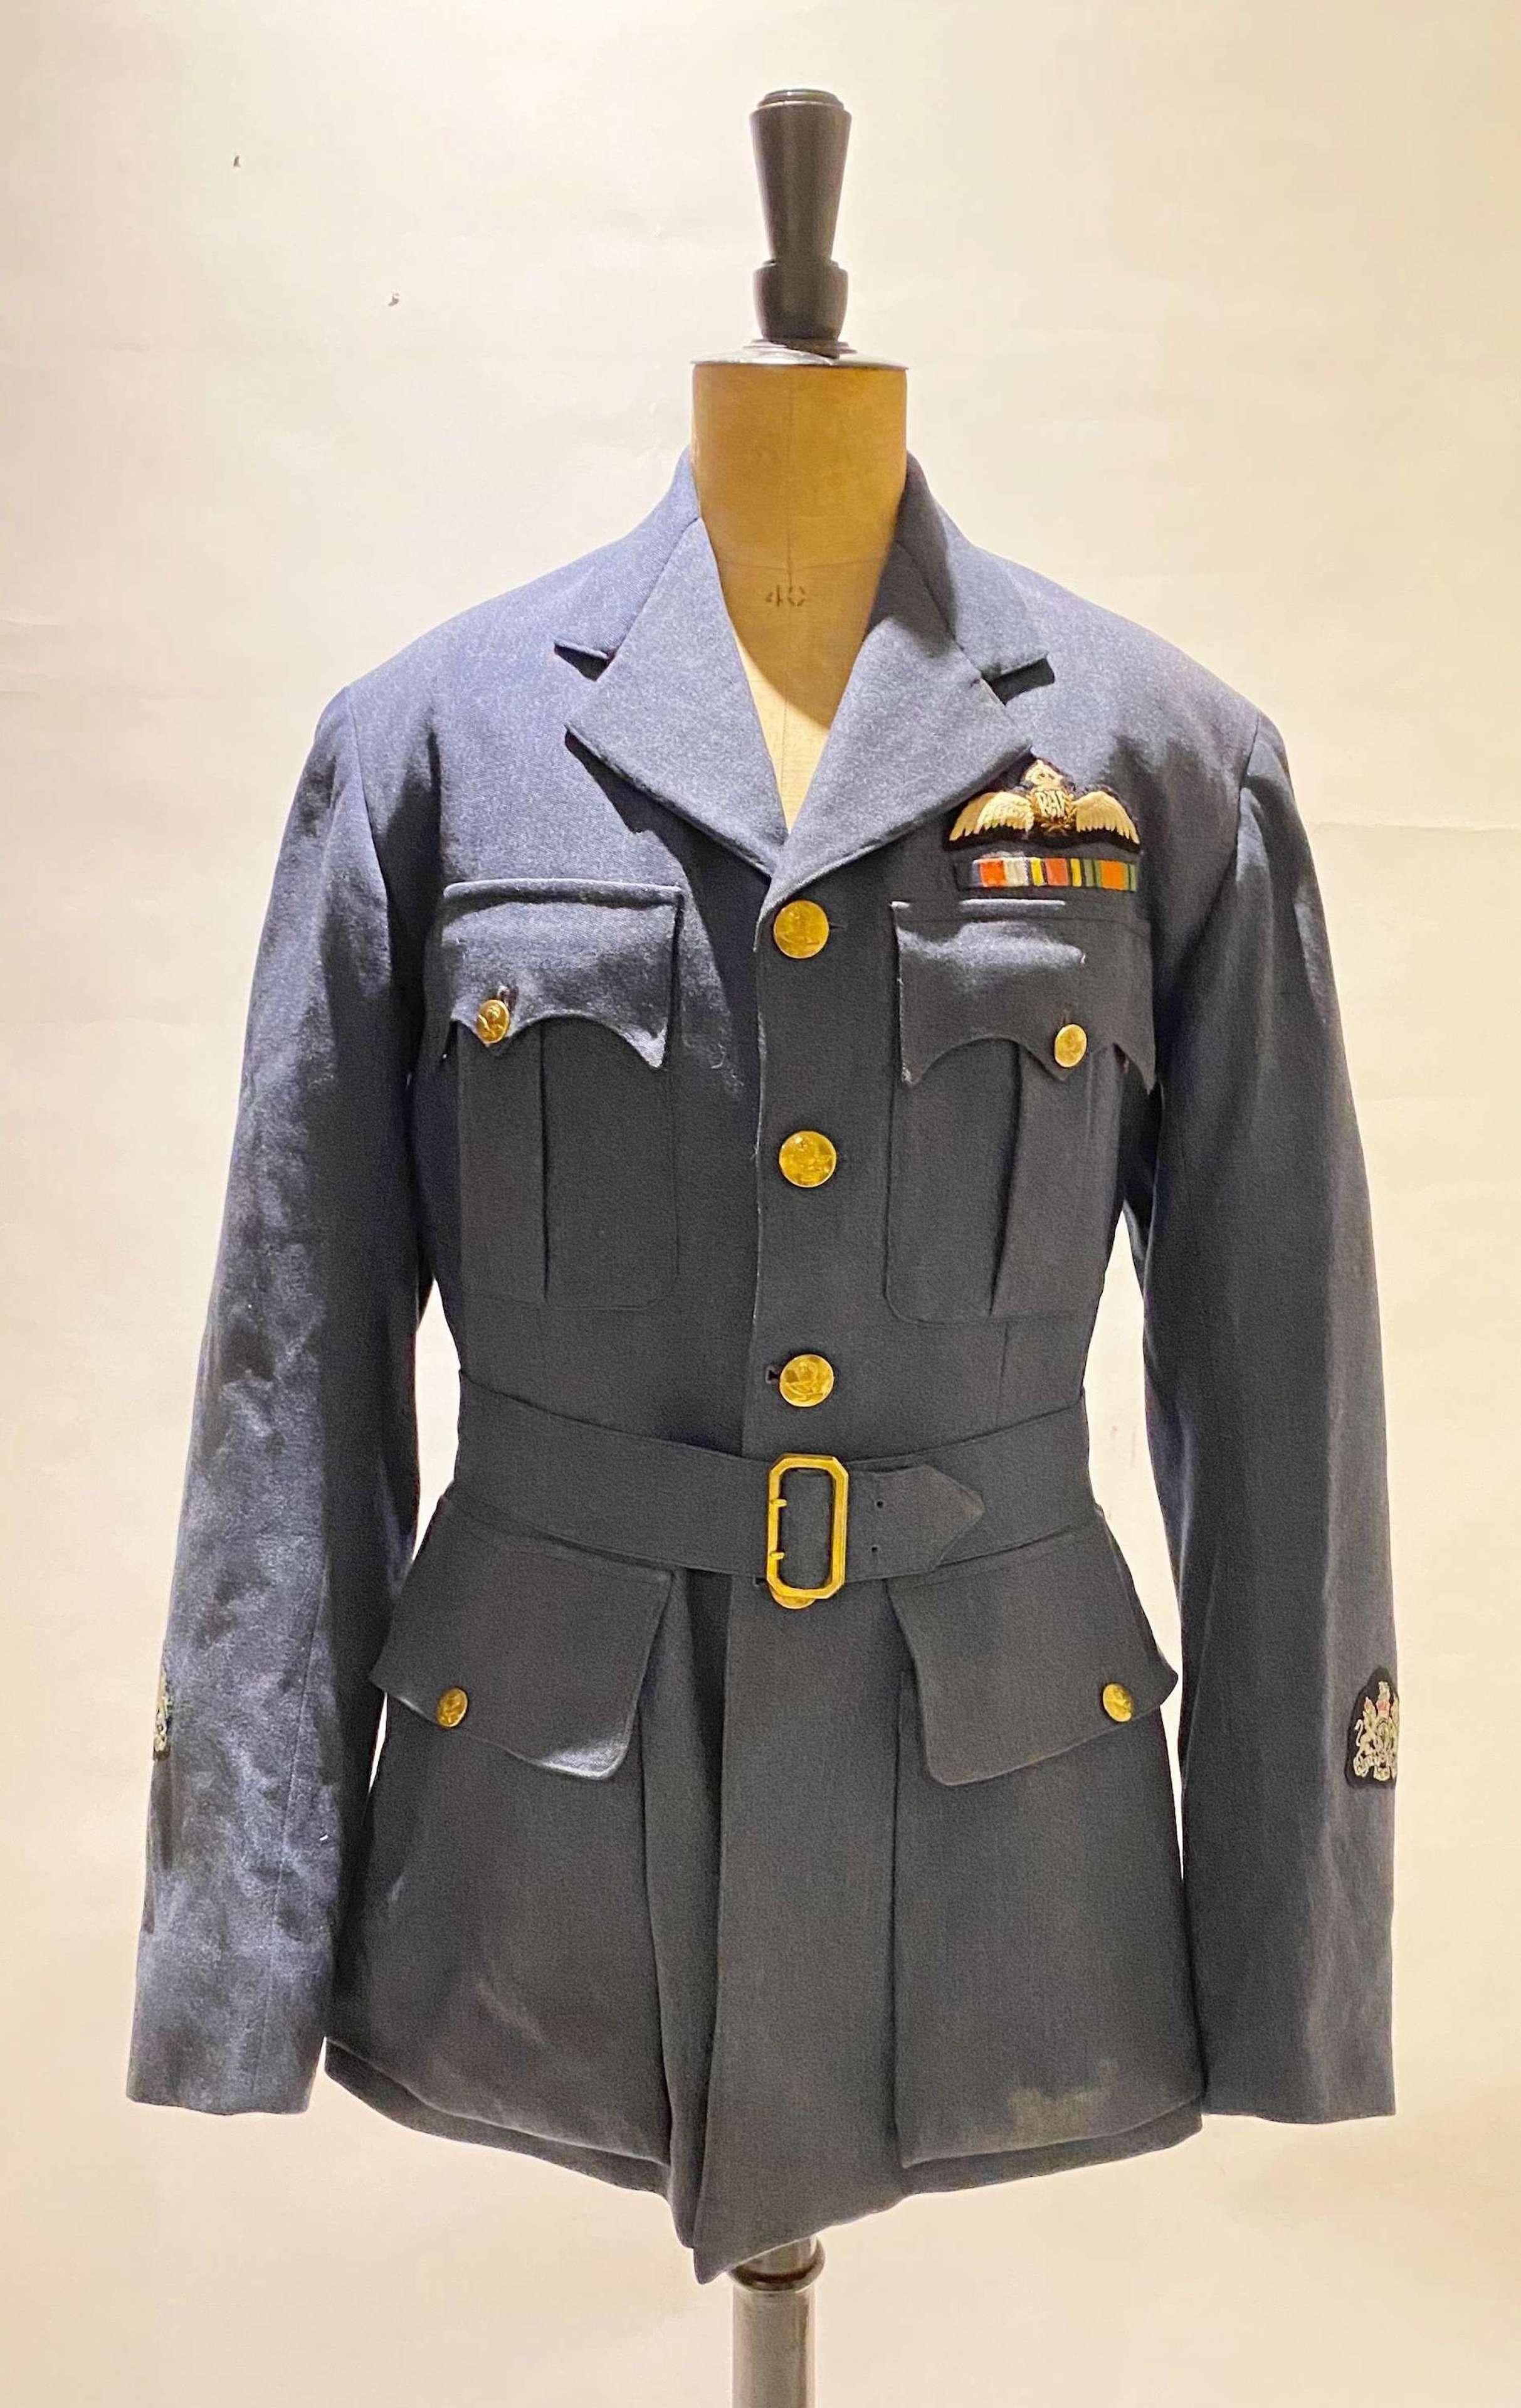 WW2 RAF Far East Burma Campaign Pilots Tunic.